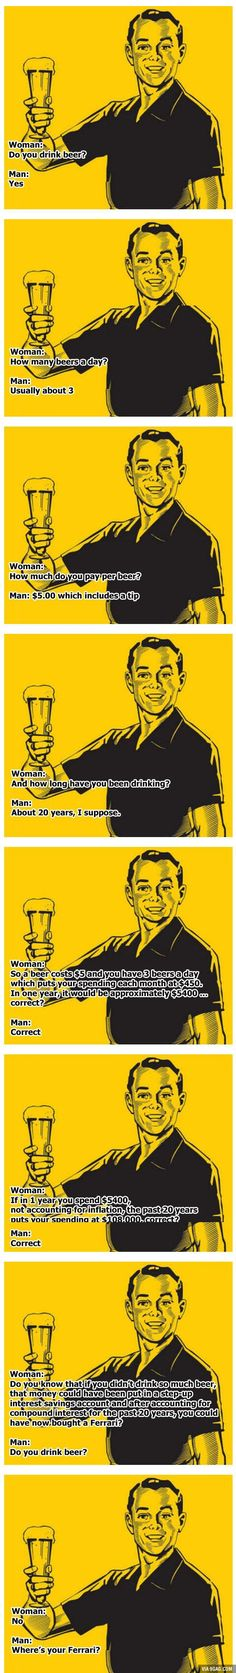 Male Logic vs Female Logic On Drinking Beer. Bros Will Understand